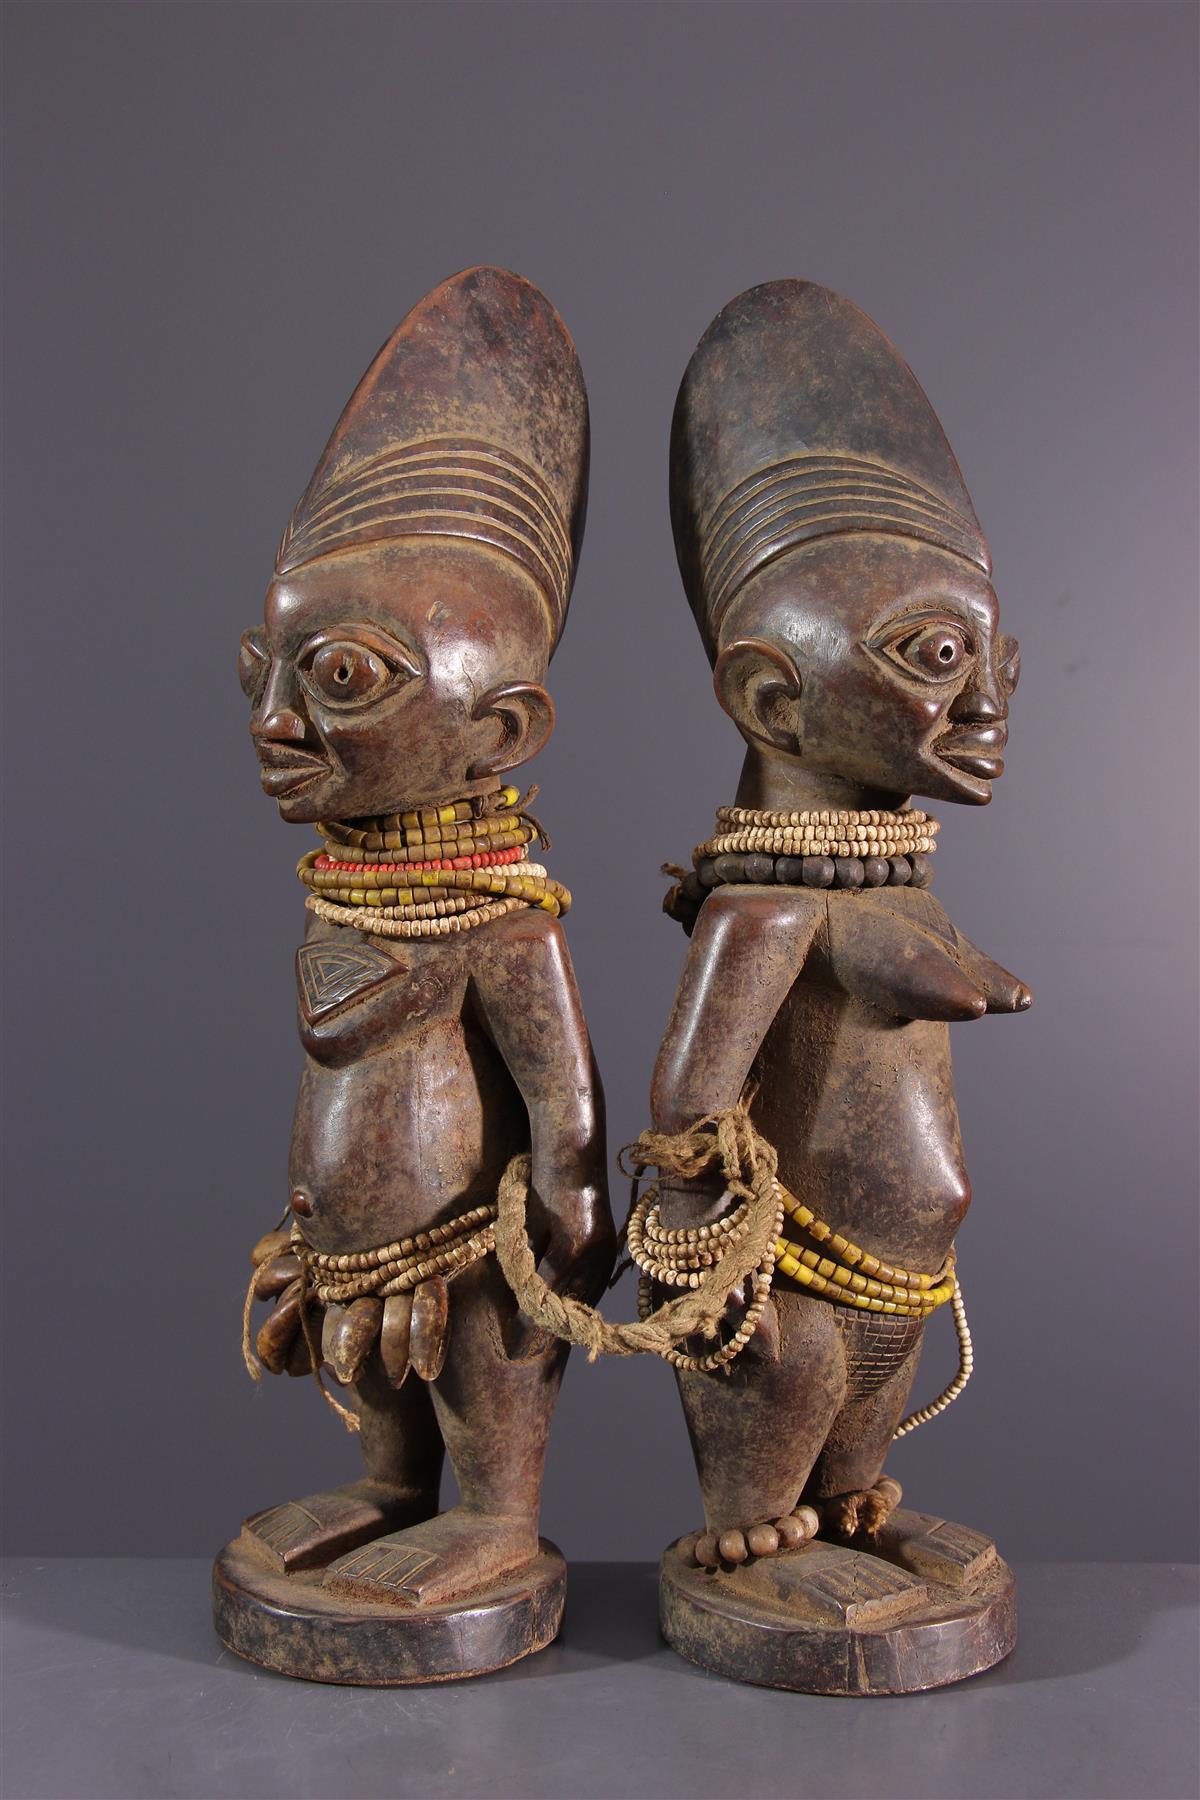 Statuettes Ere Ibeji - Art africain